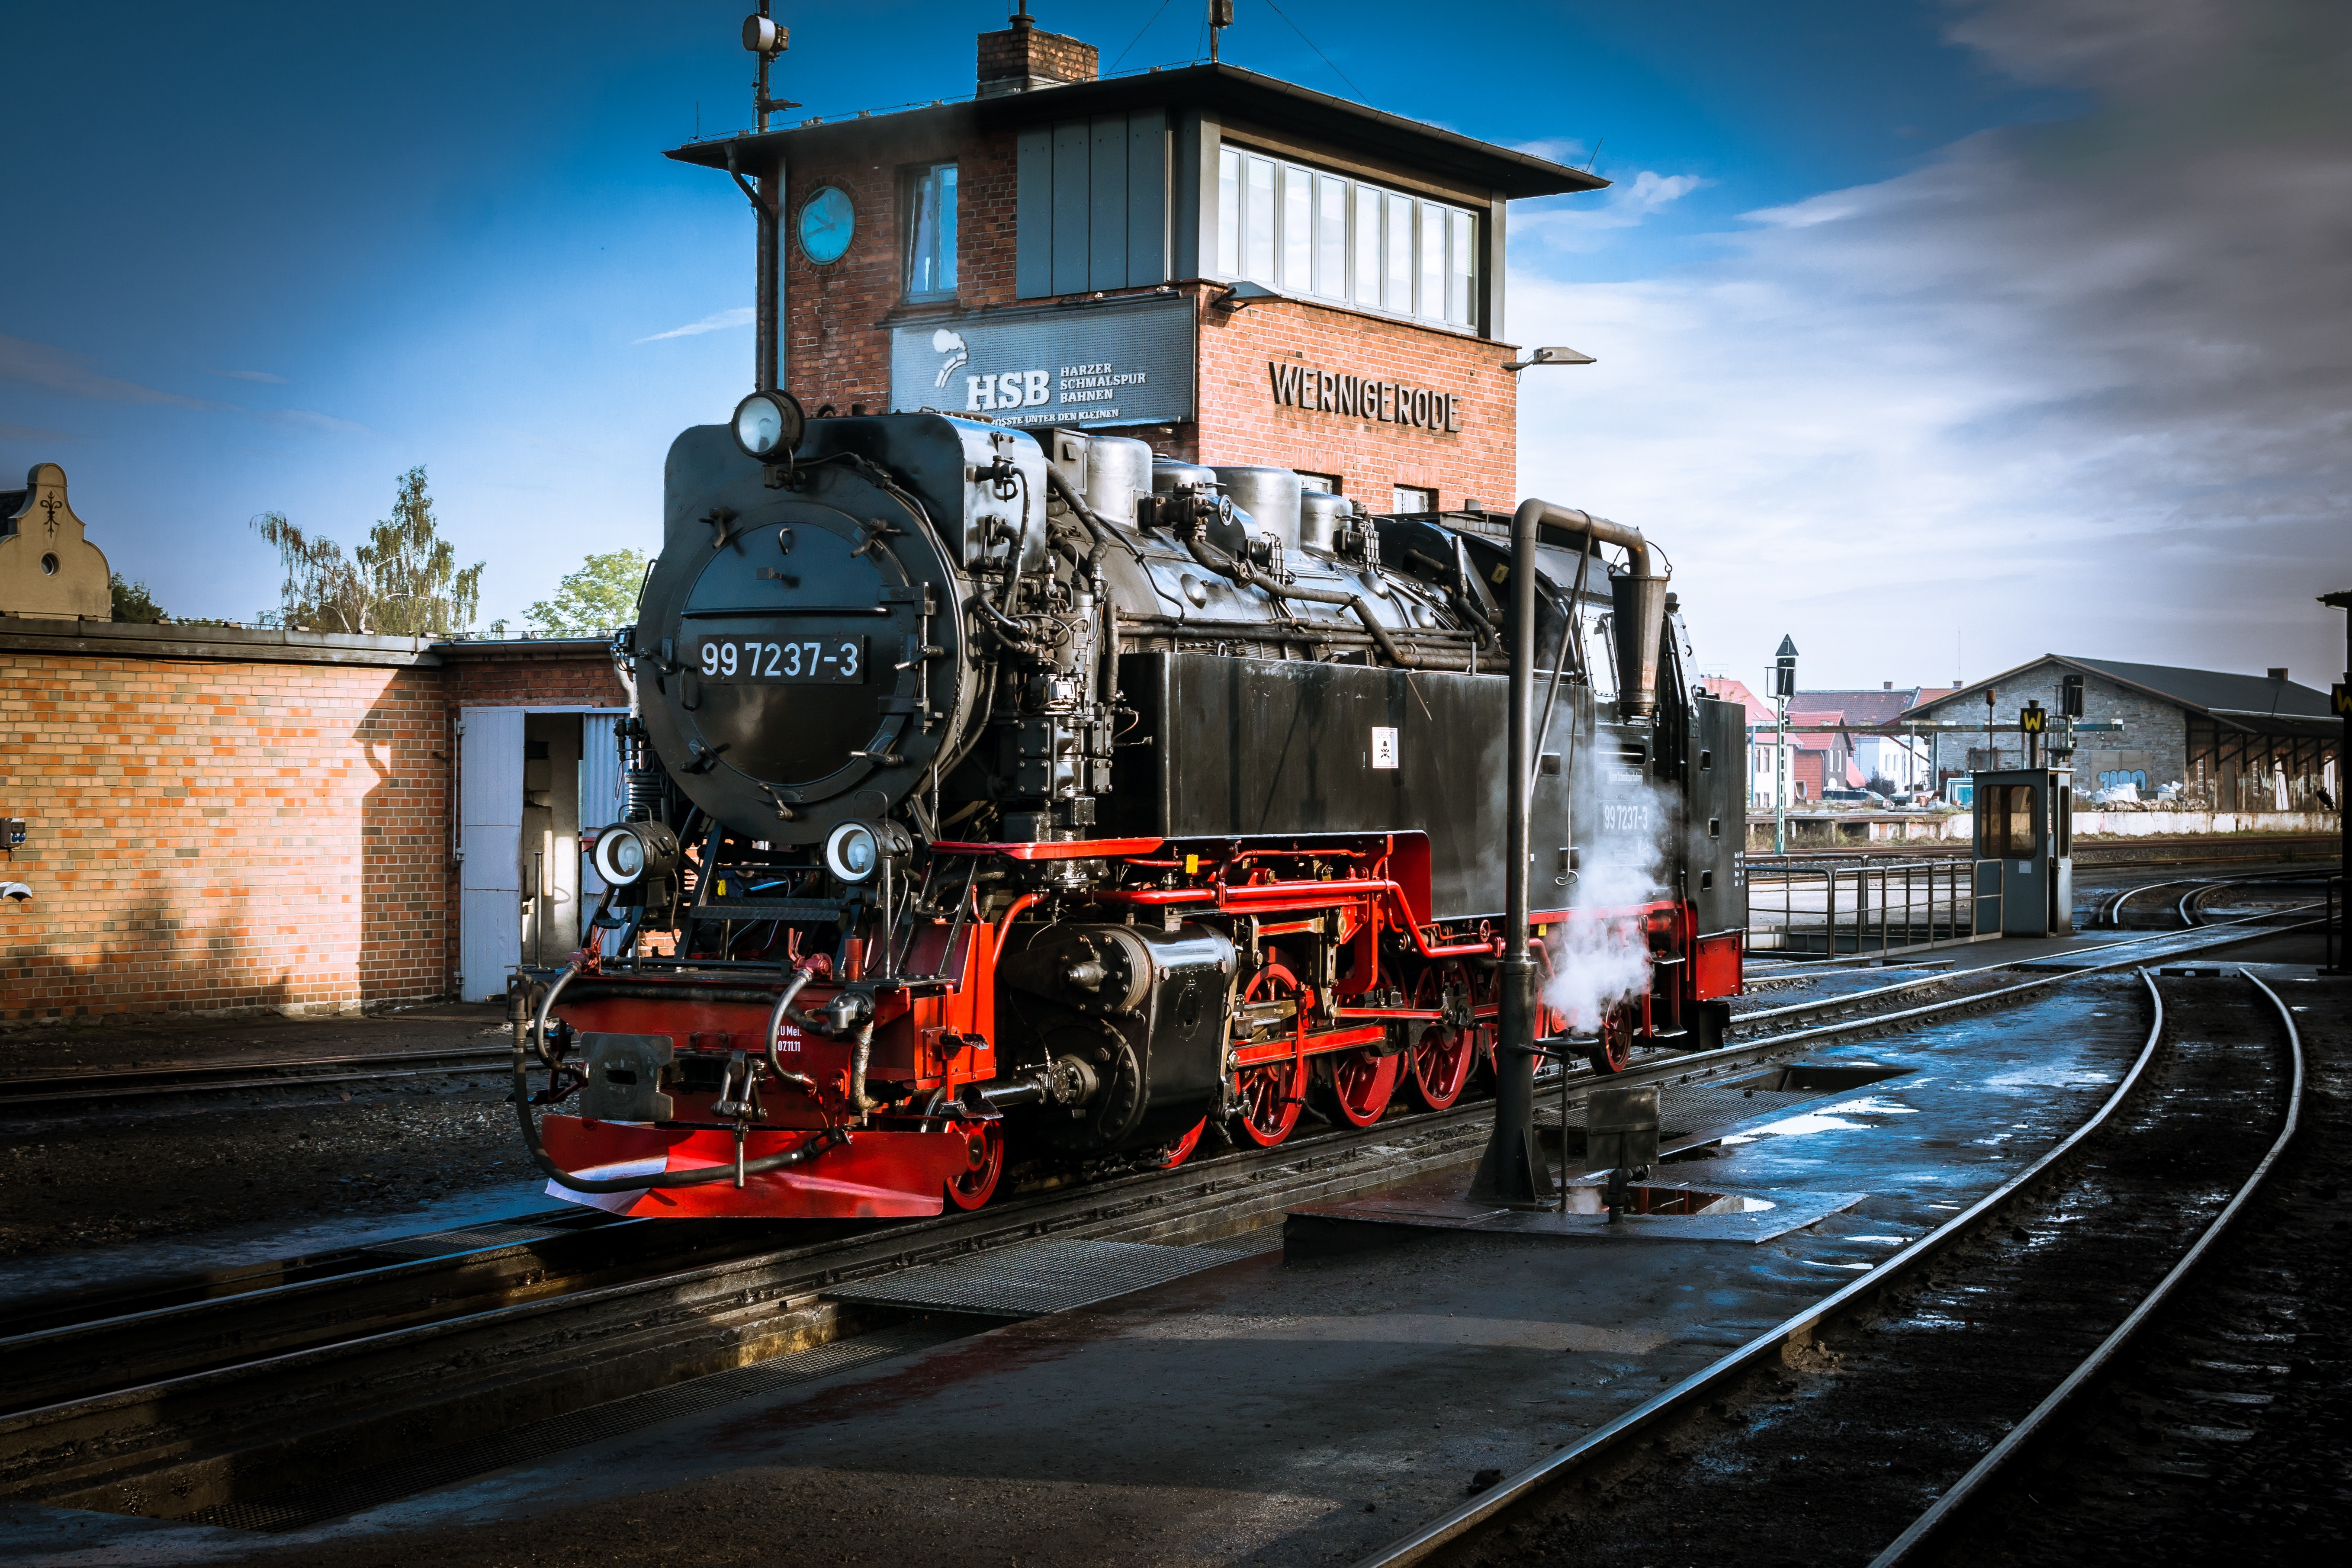 Train on railroad tracks against sky photo